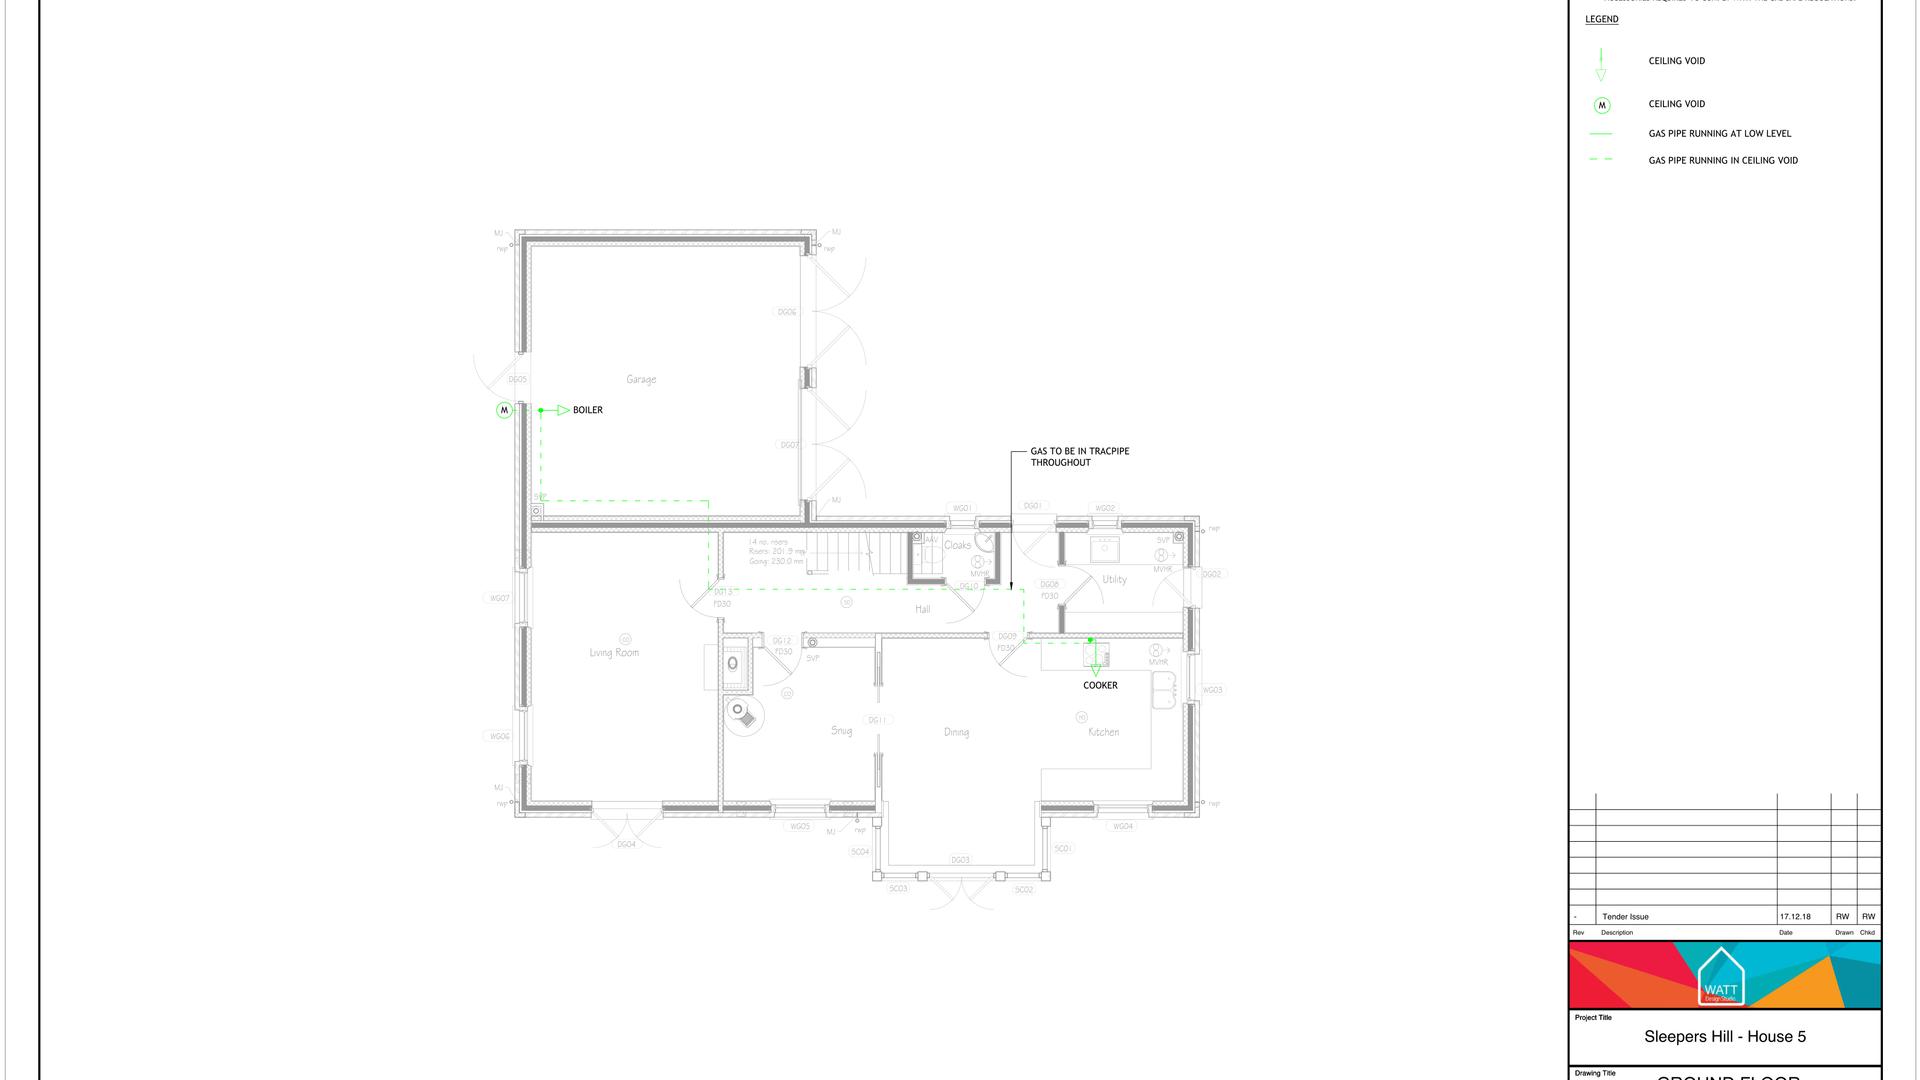 G V00 - Sleepers Hill - House 5 - Gas La